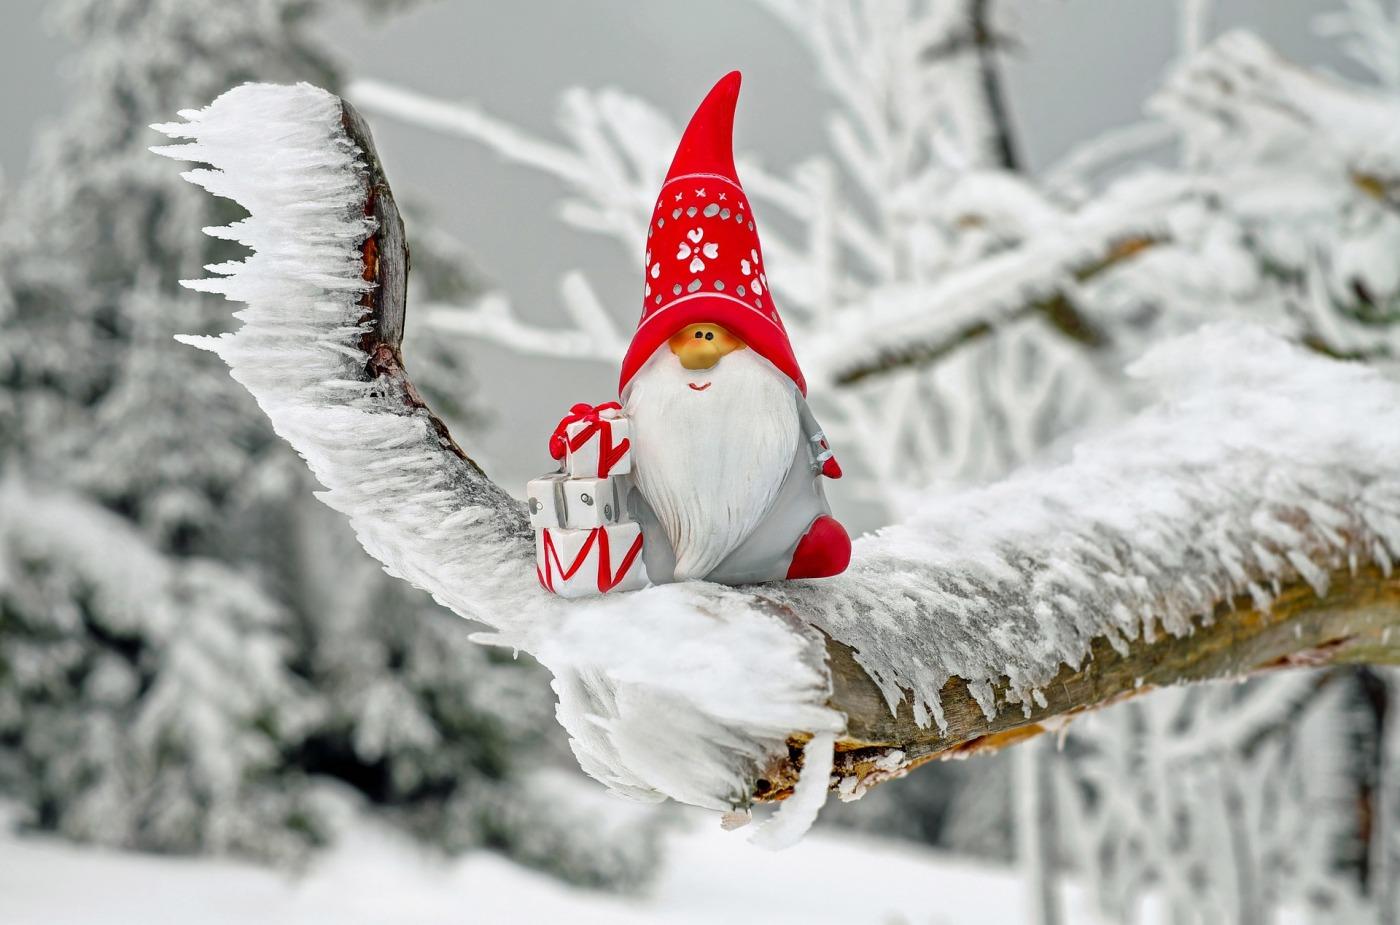 Santa Clause - Holiday Spirit